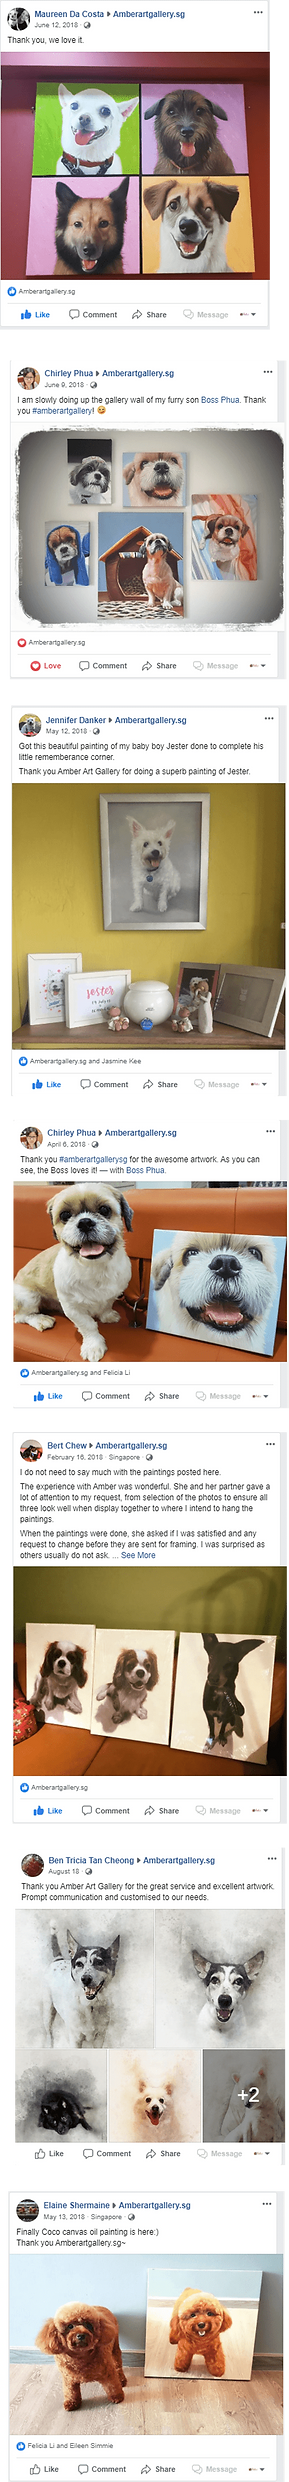 Amber Art Gallery Facebook Testimonials